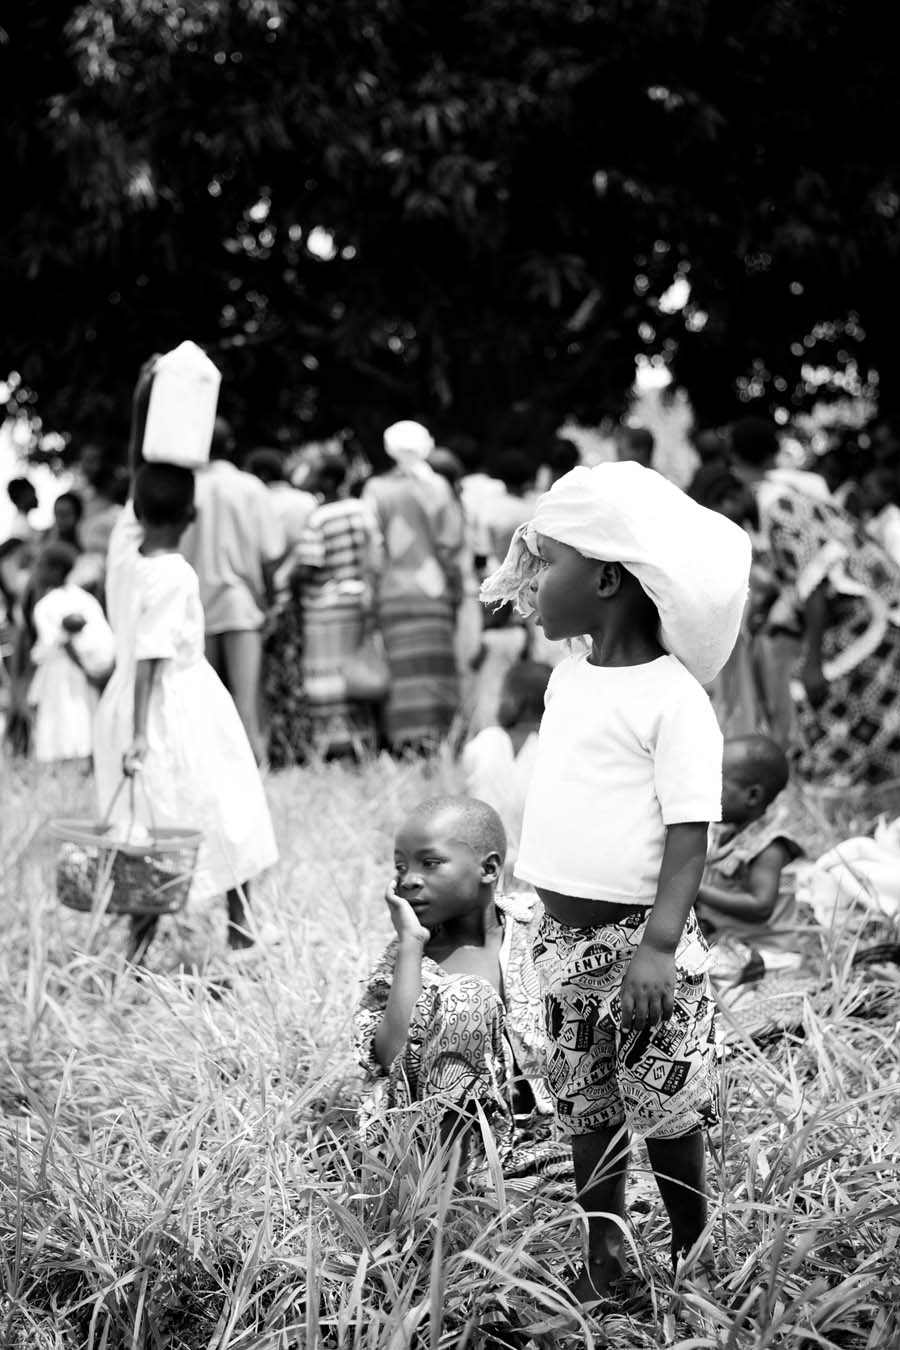 jessicadavisphotography.com | Jessica Davis Photography | Portrait Work in Uganda| Travel Photographer | World Event Photographs 7 (12).jpg